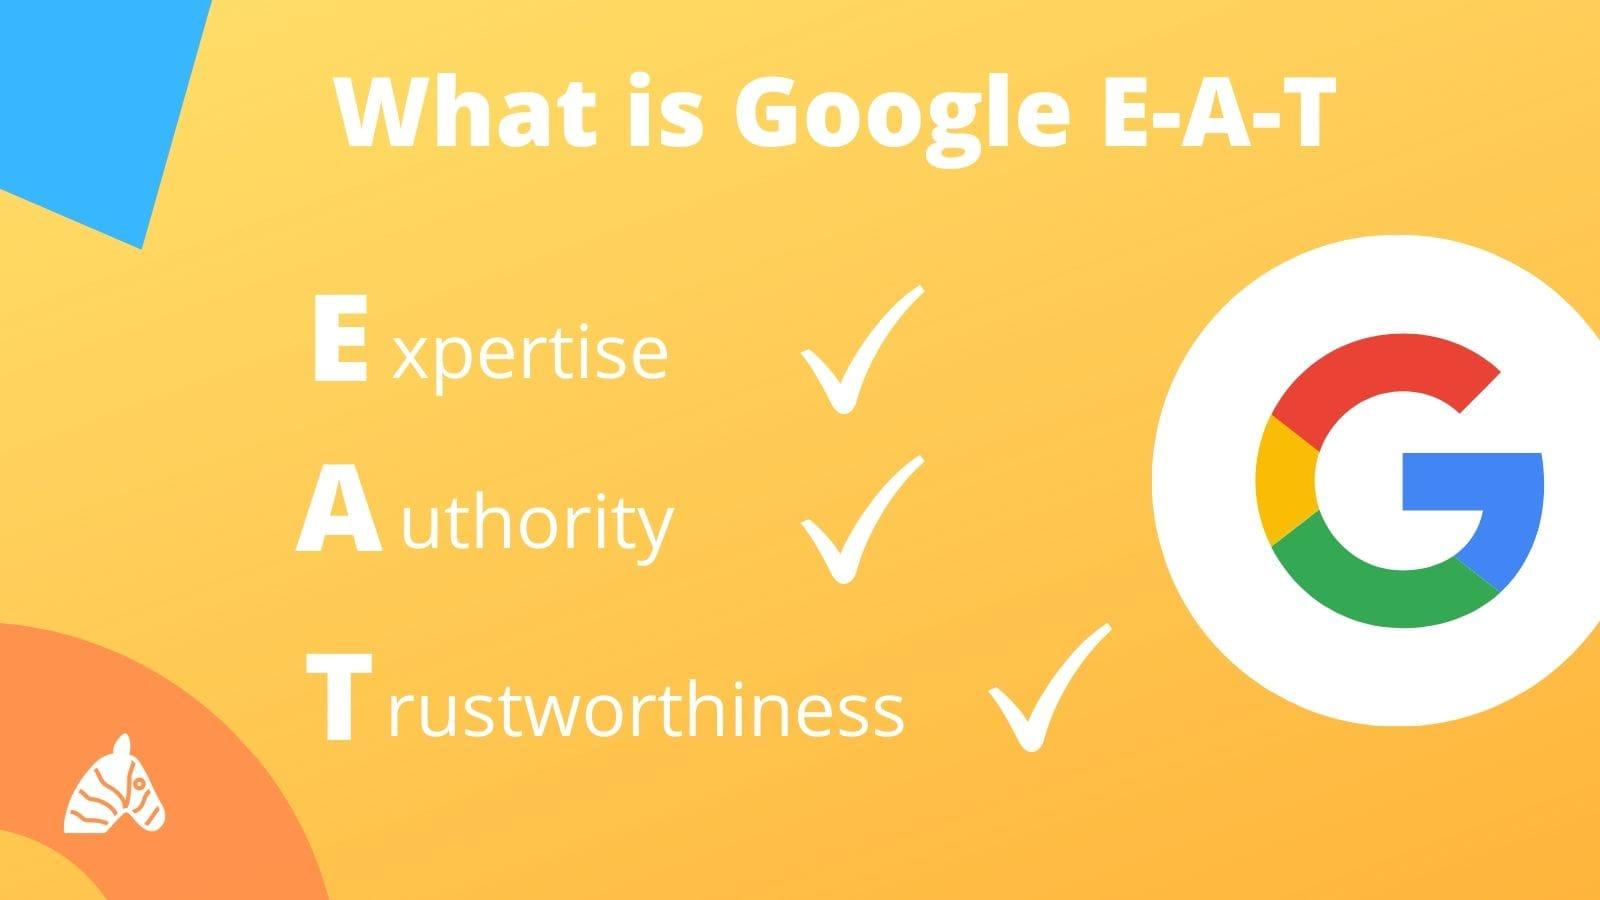 Google E-A-T acronym explained